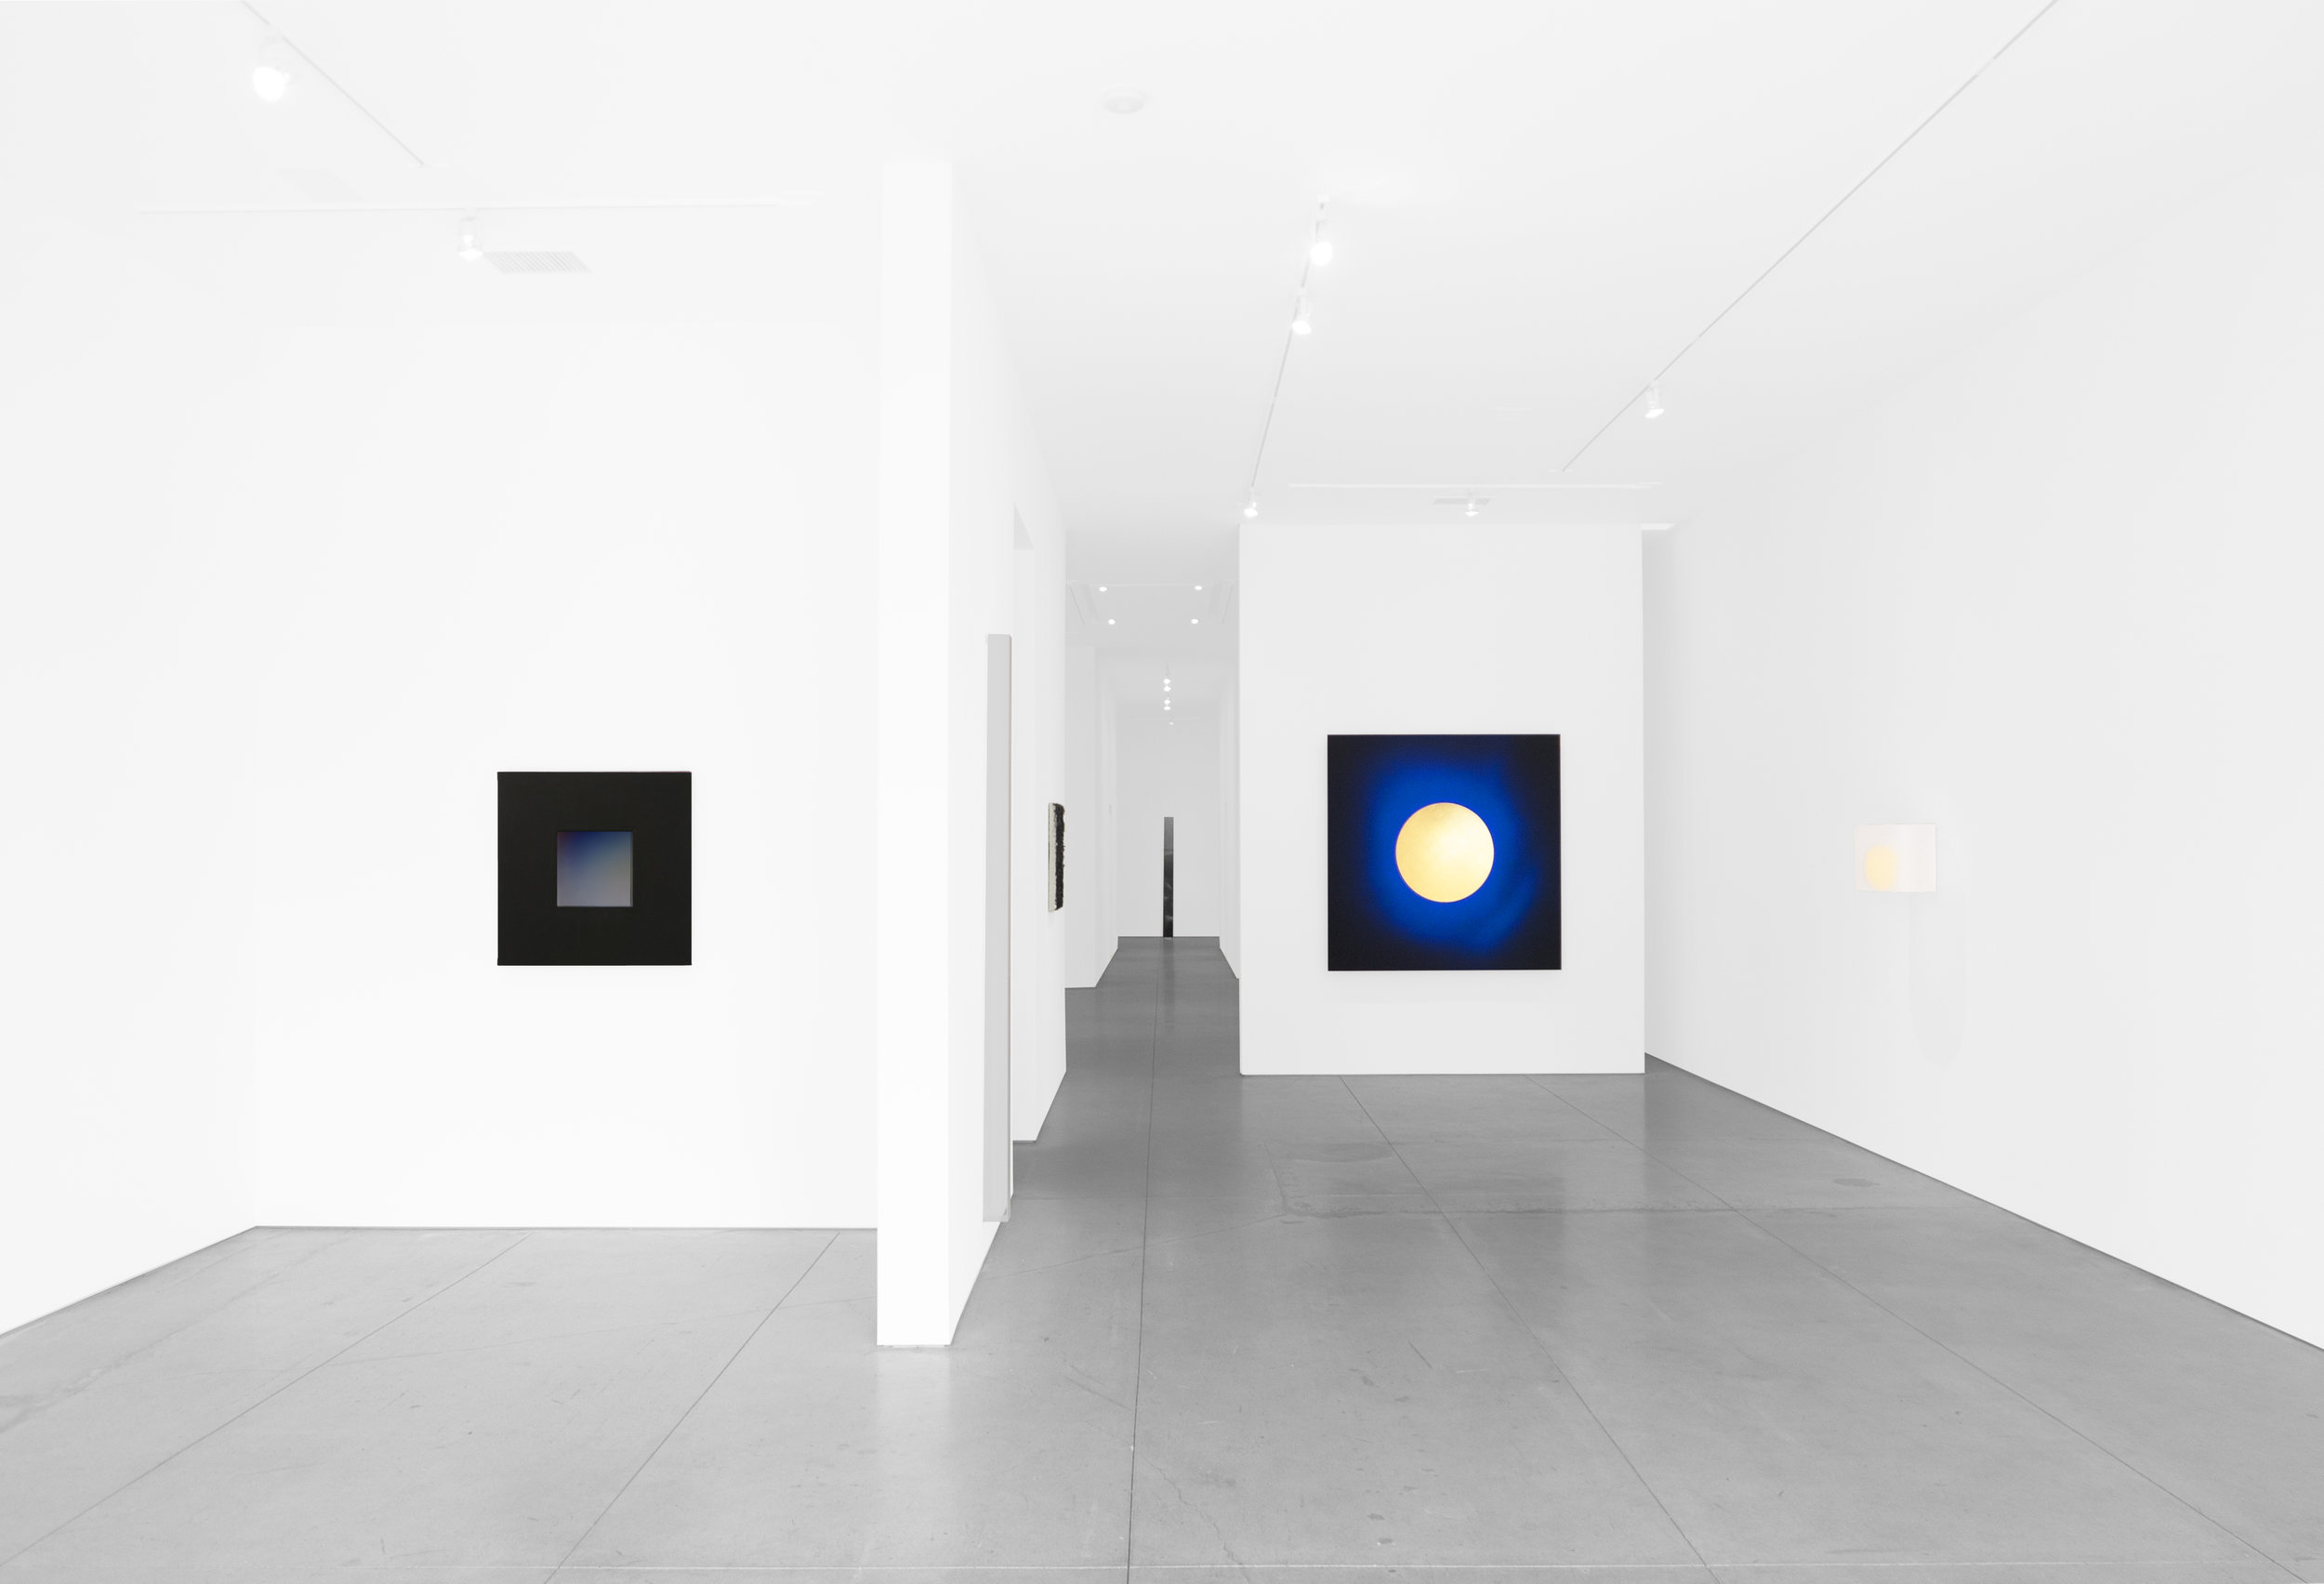 25 Years_Peter Blake Gallery_2019_Installation View_1.jpg